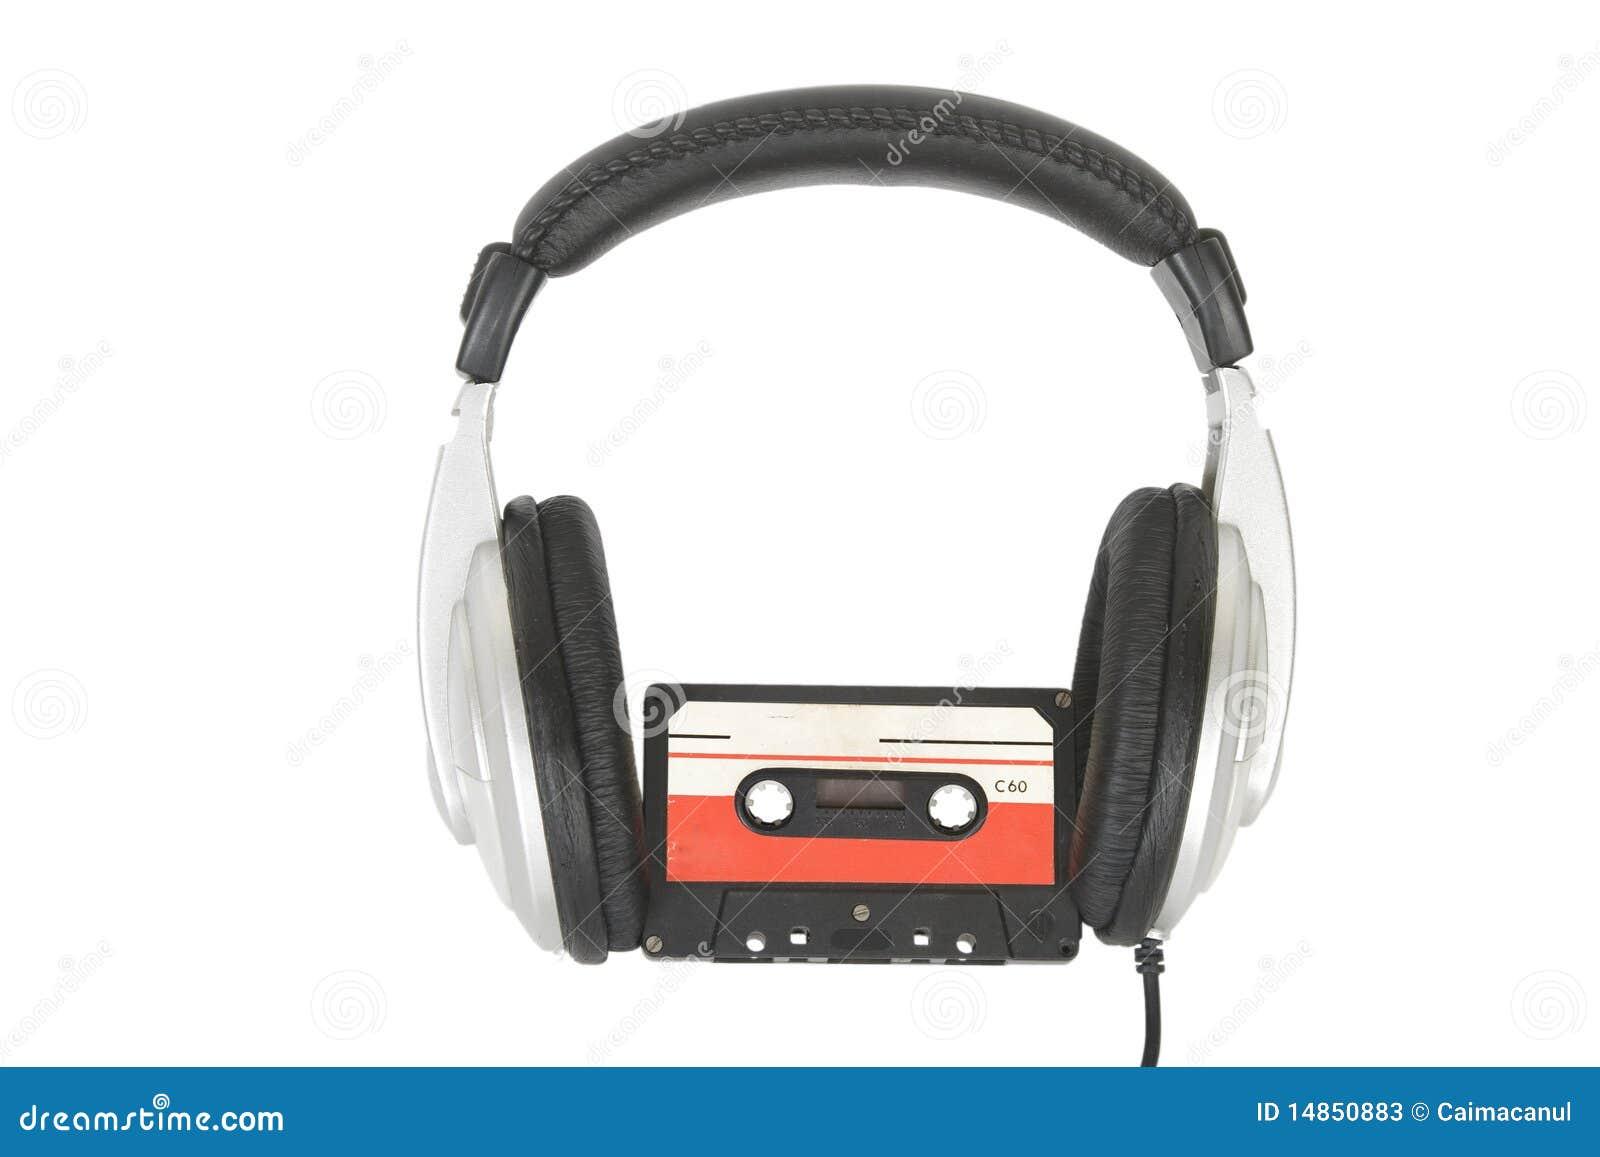 Dj headphones and audio cassette